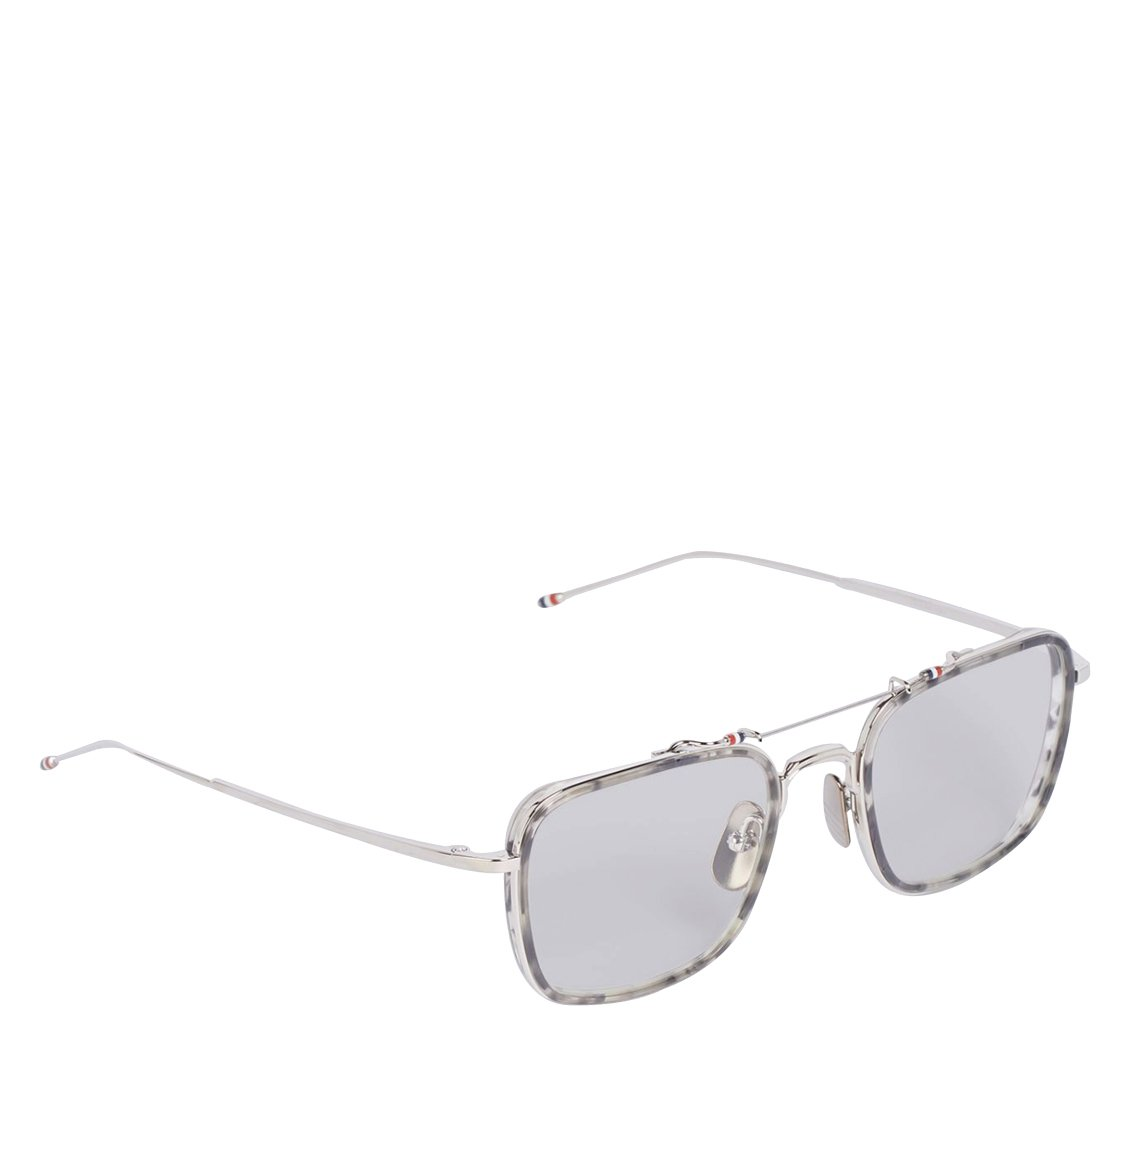 Thom Browne 53 Square Frame Grey Tortoiseshell Sunglasses Γυαλιά Ηλίου